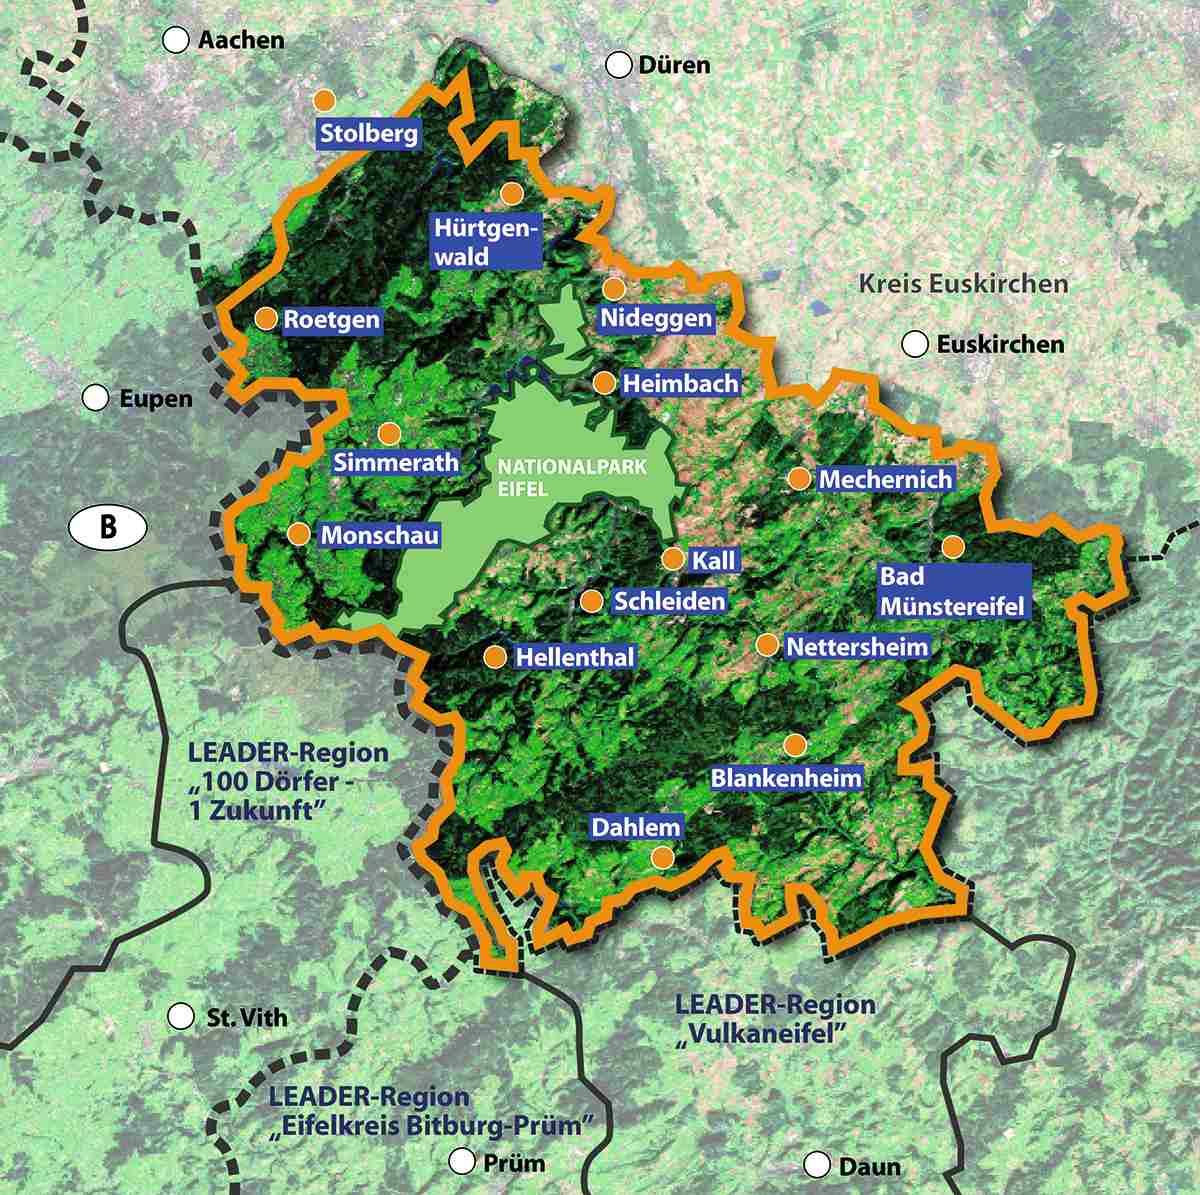 Karte Eifel.Nettersheim Leader Region Eifel In Neuem Design